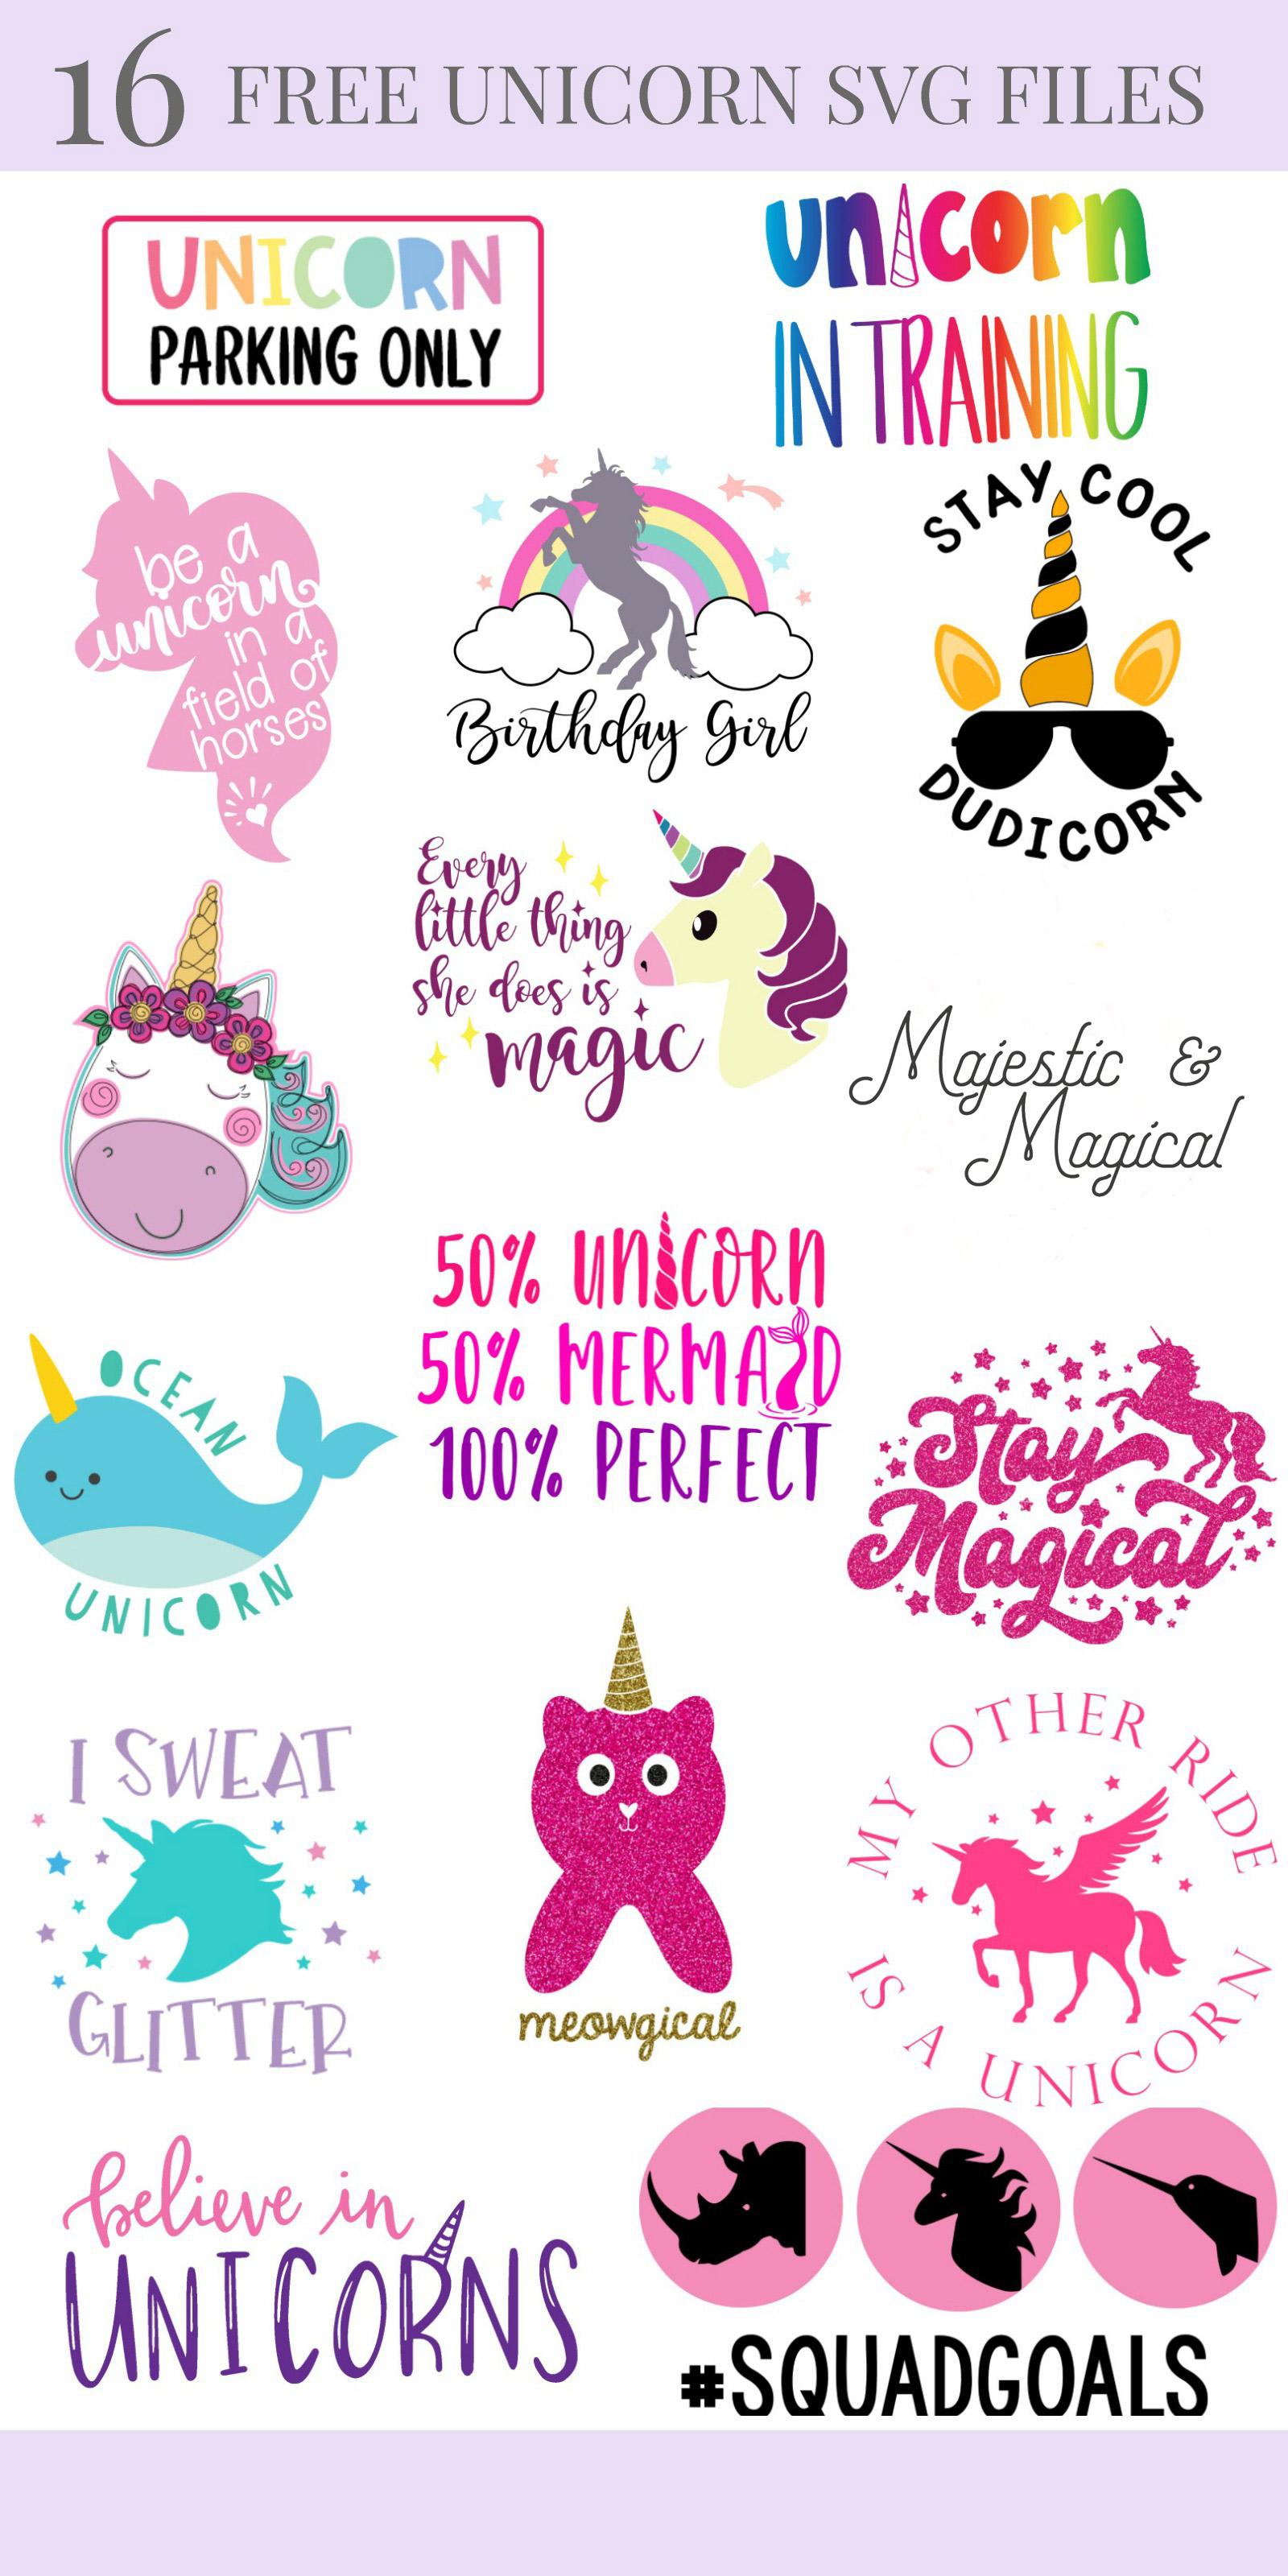 Unicorn Head Svg Free : unicorn, First, Birthday, Unicorn